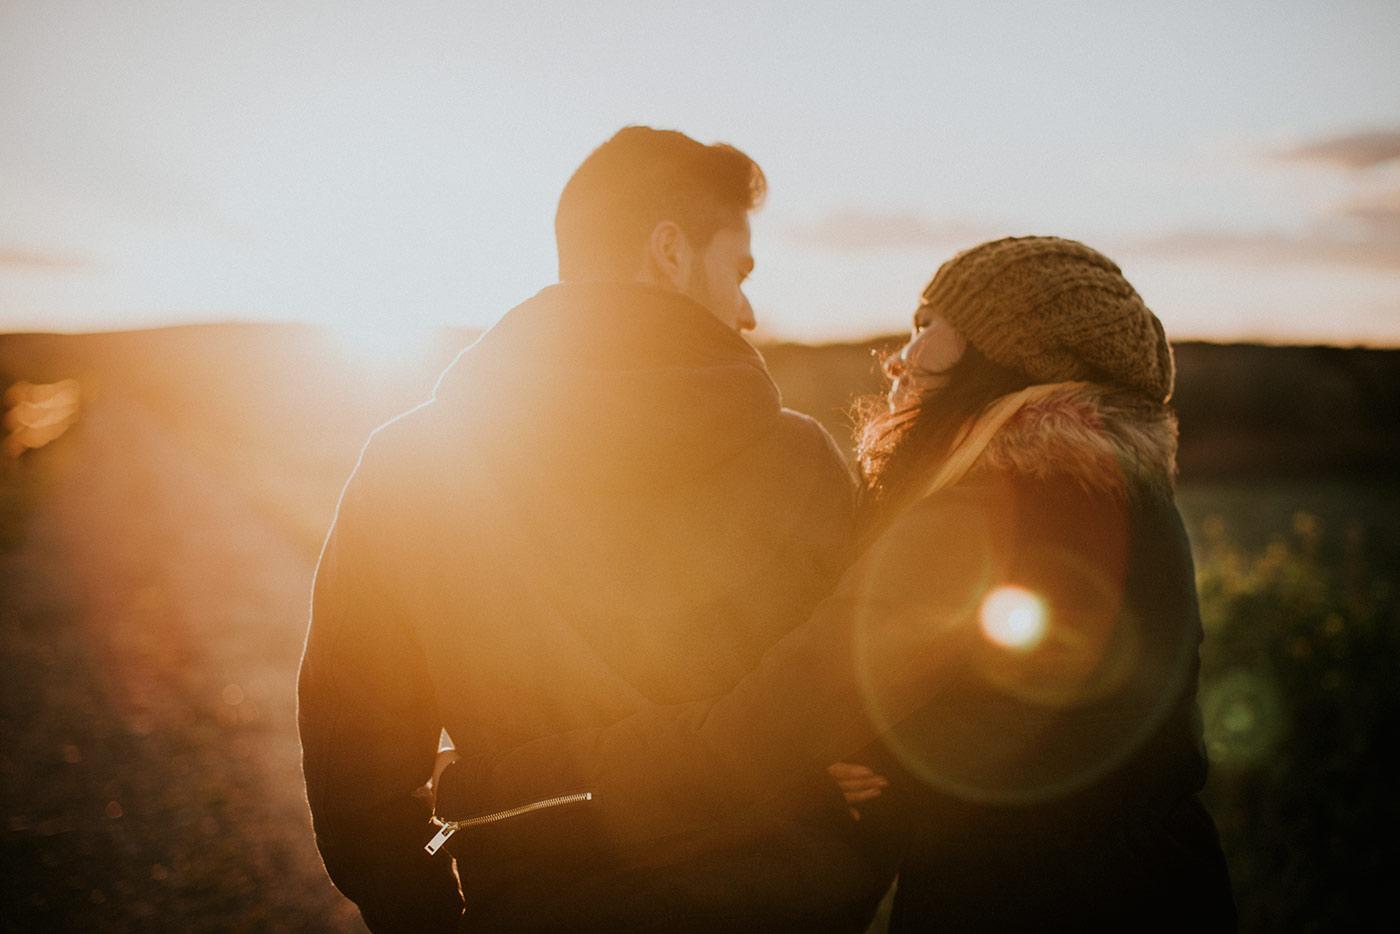 sesión de preboda, sesión de pareja, mejor hora para hacer sesión de fotos